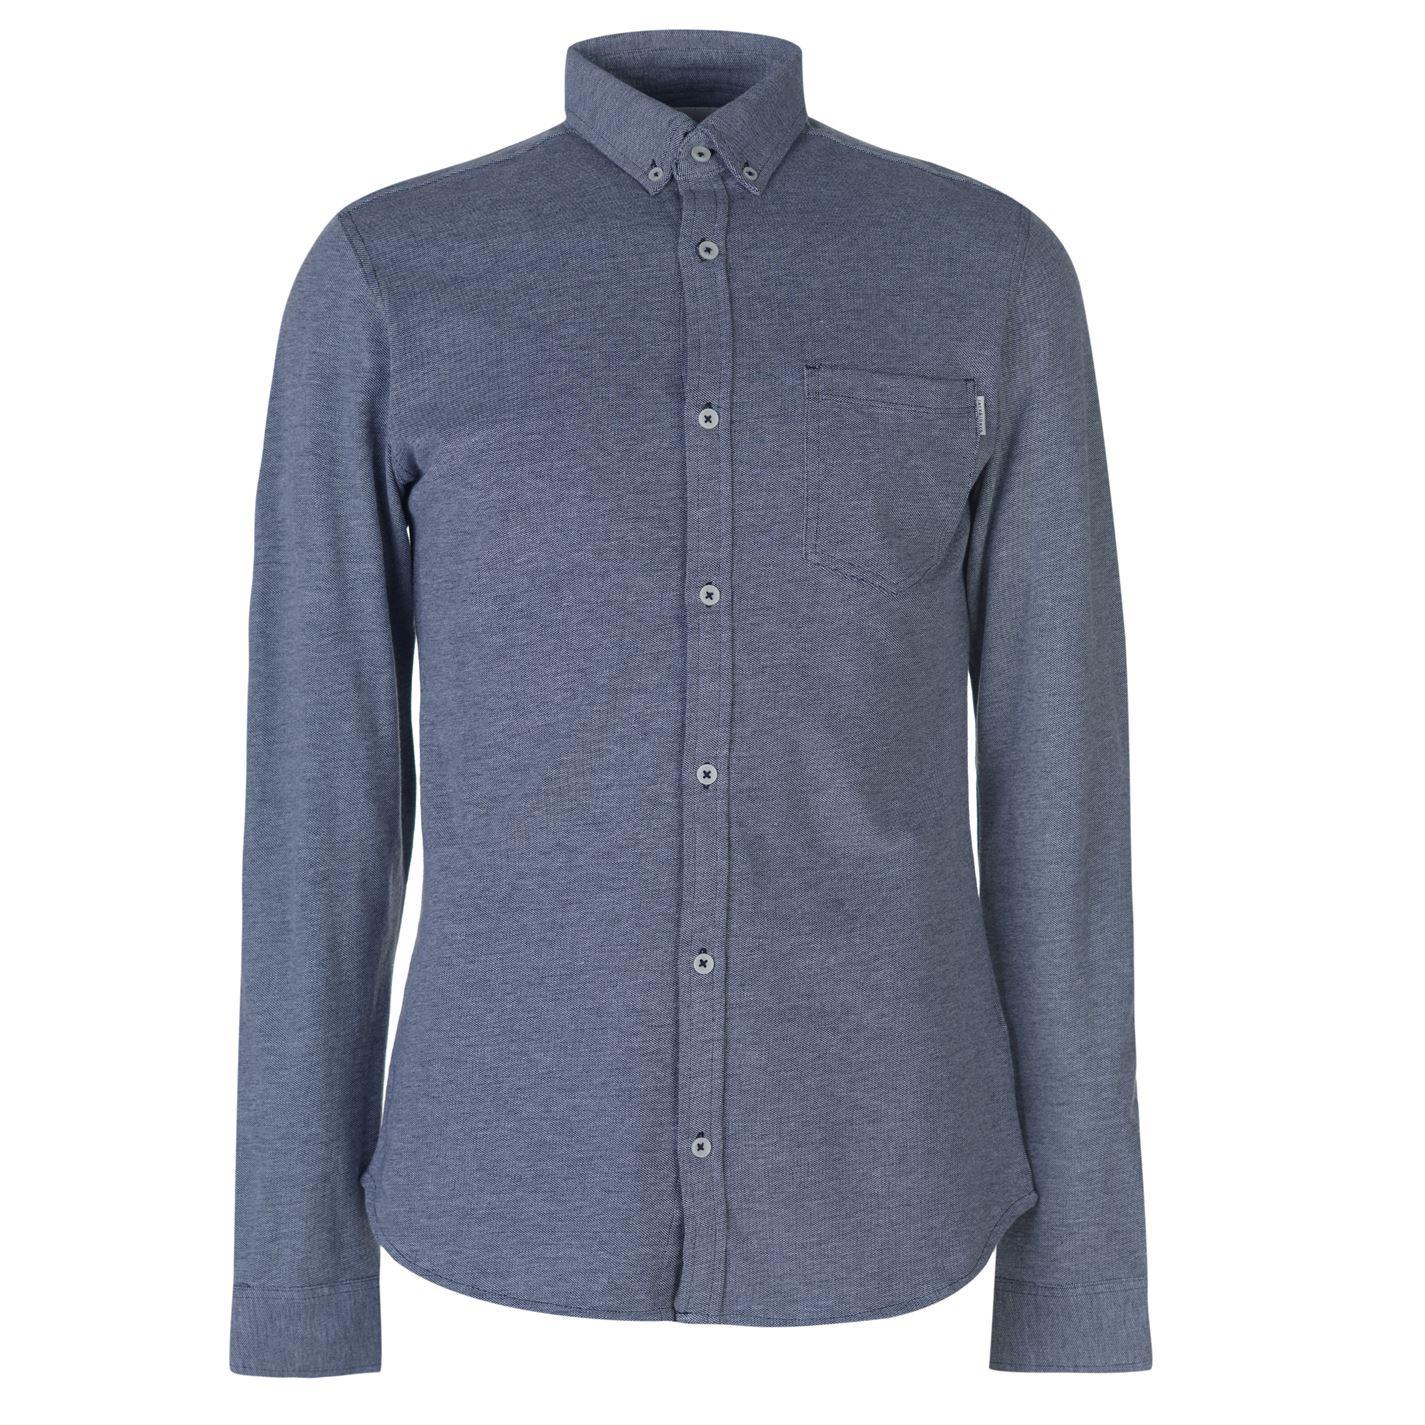 Jack and Jones Core Alex Long Sleeve Shirt